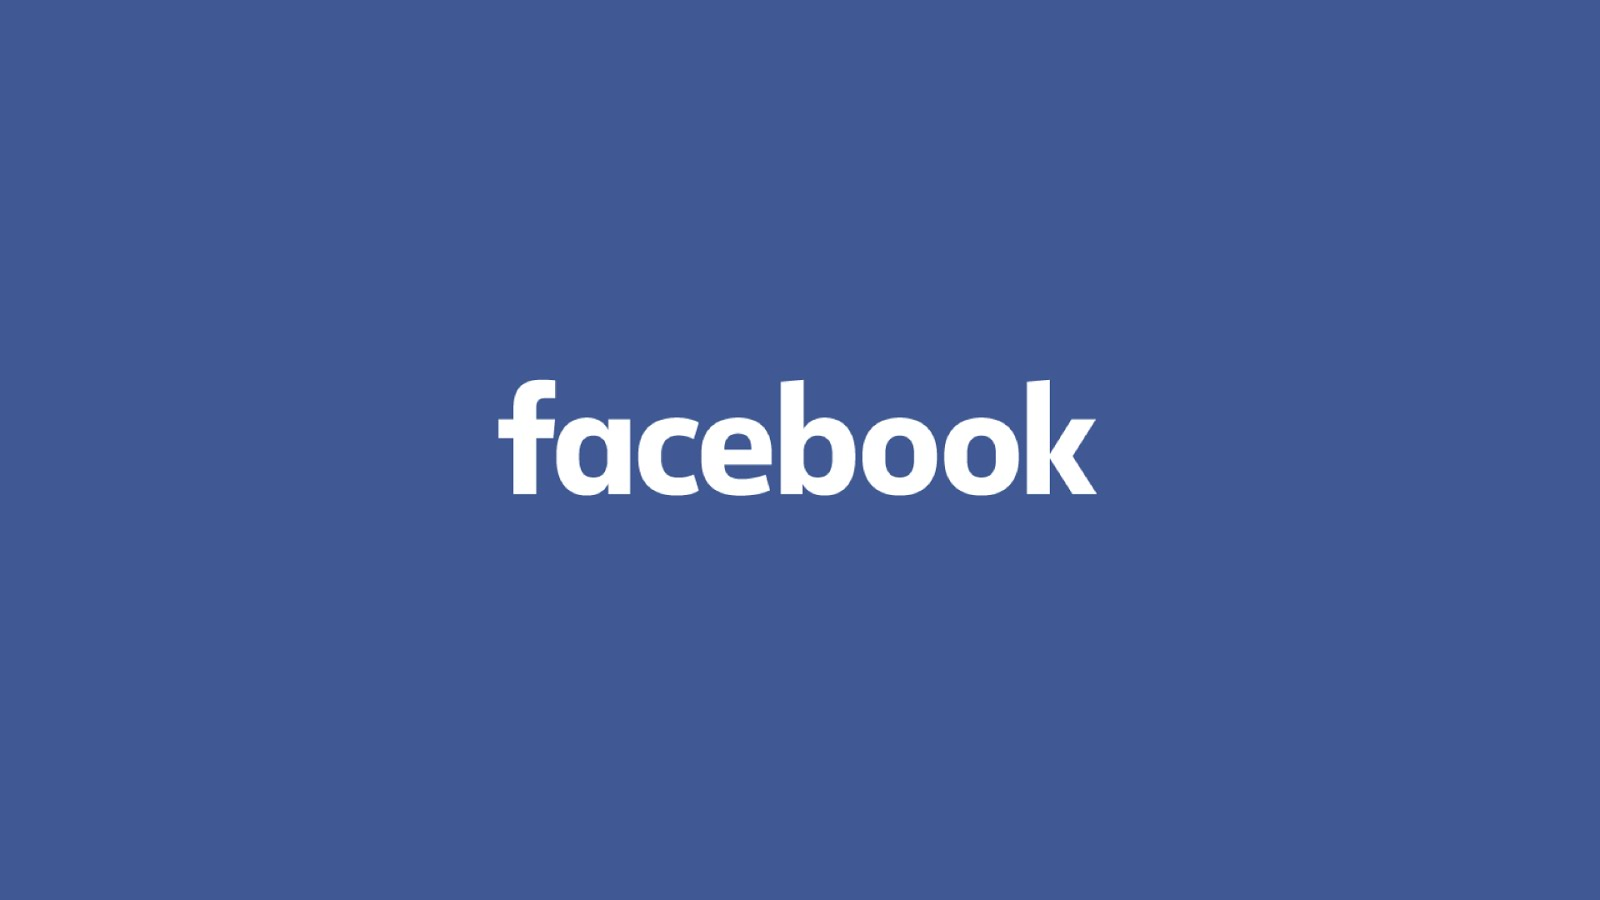 Zapraszam na mojego Facebooka